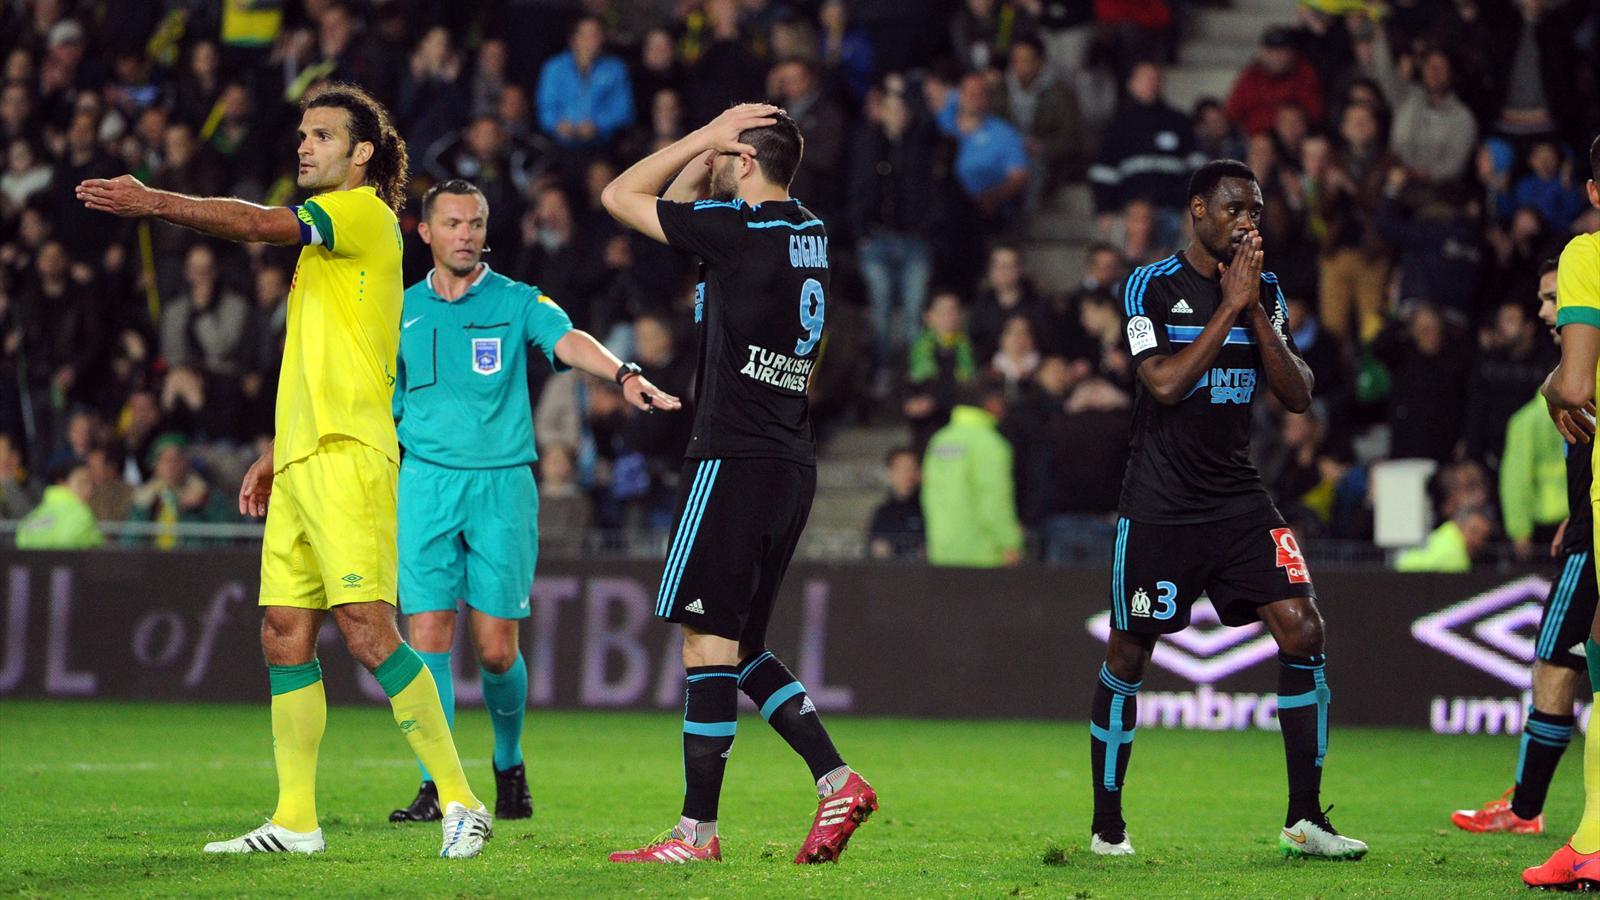 Video: Nantes vs Olympique Marseille